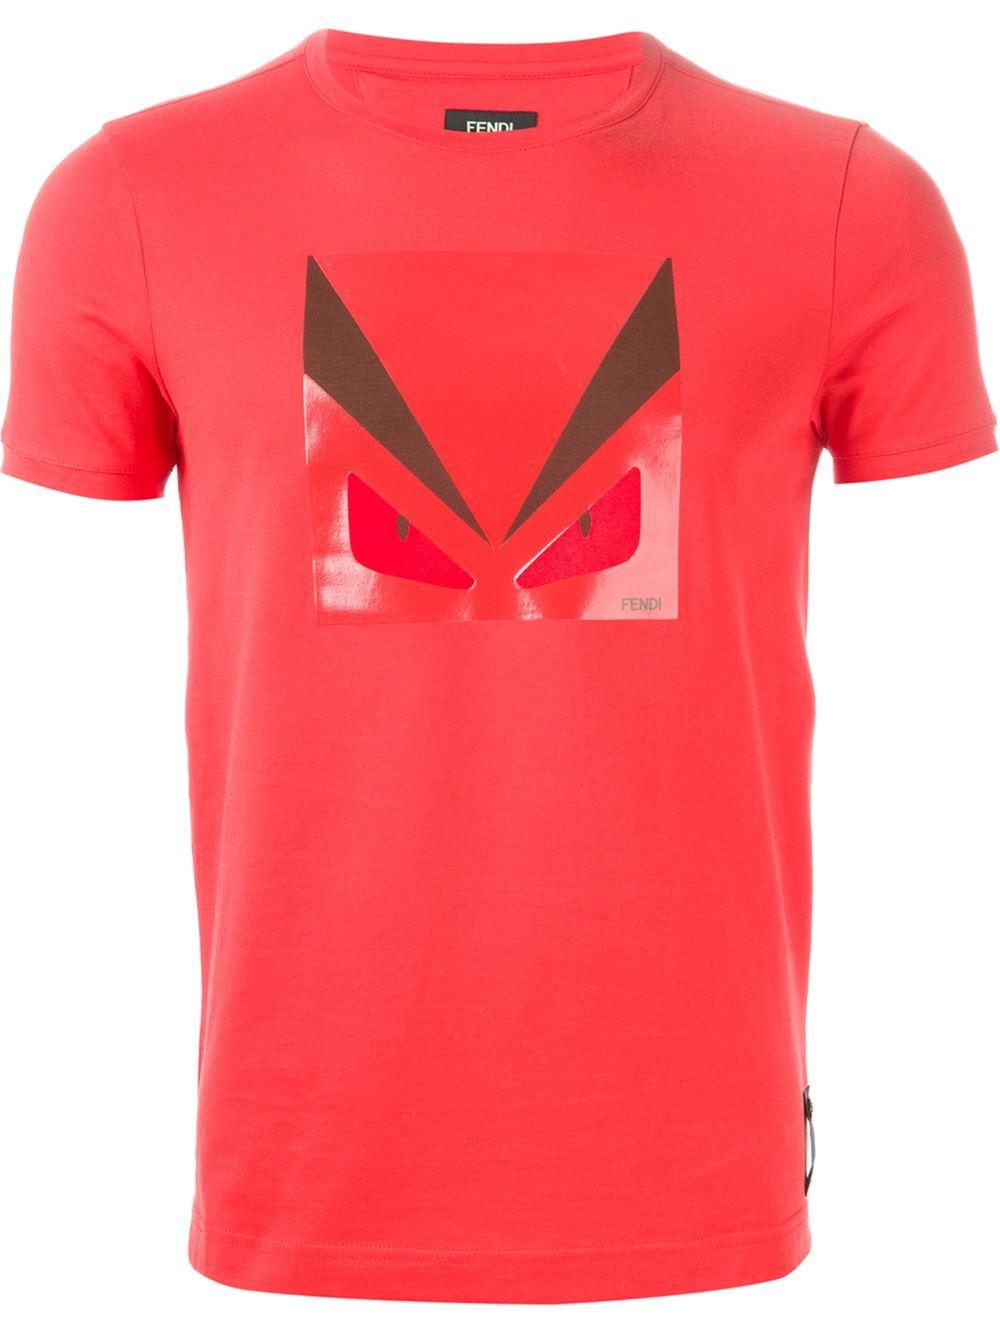 Lyst Fendi Bug Print T Shirt In Red For Men